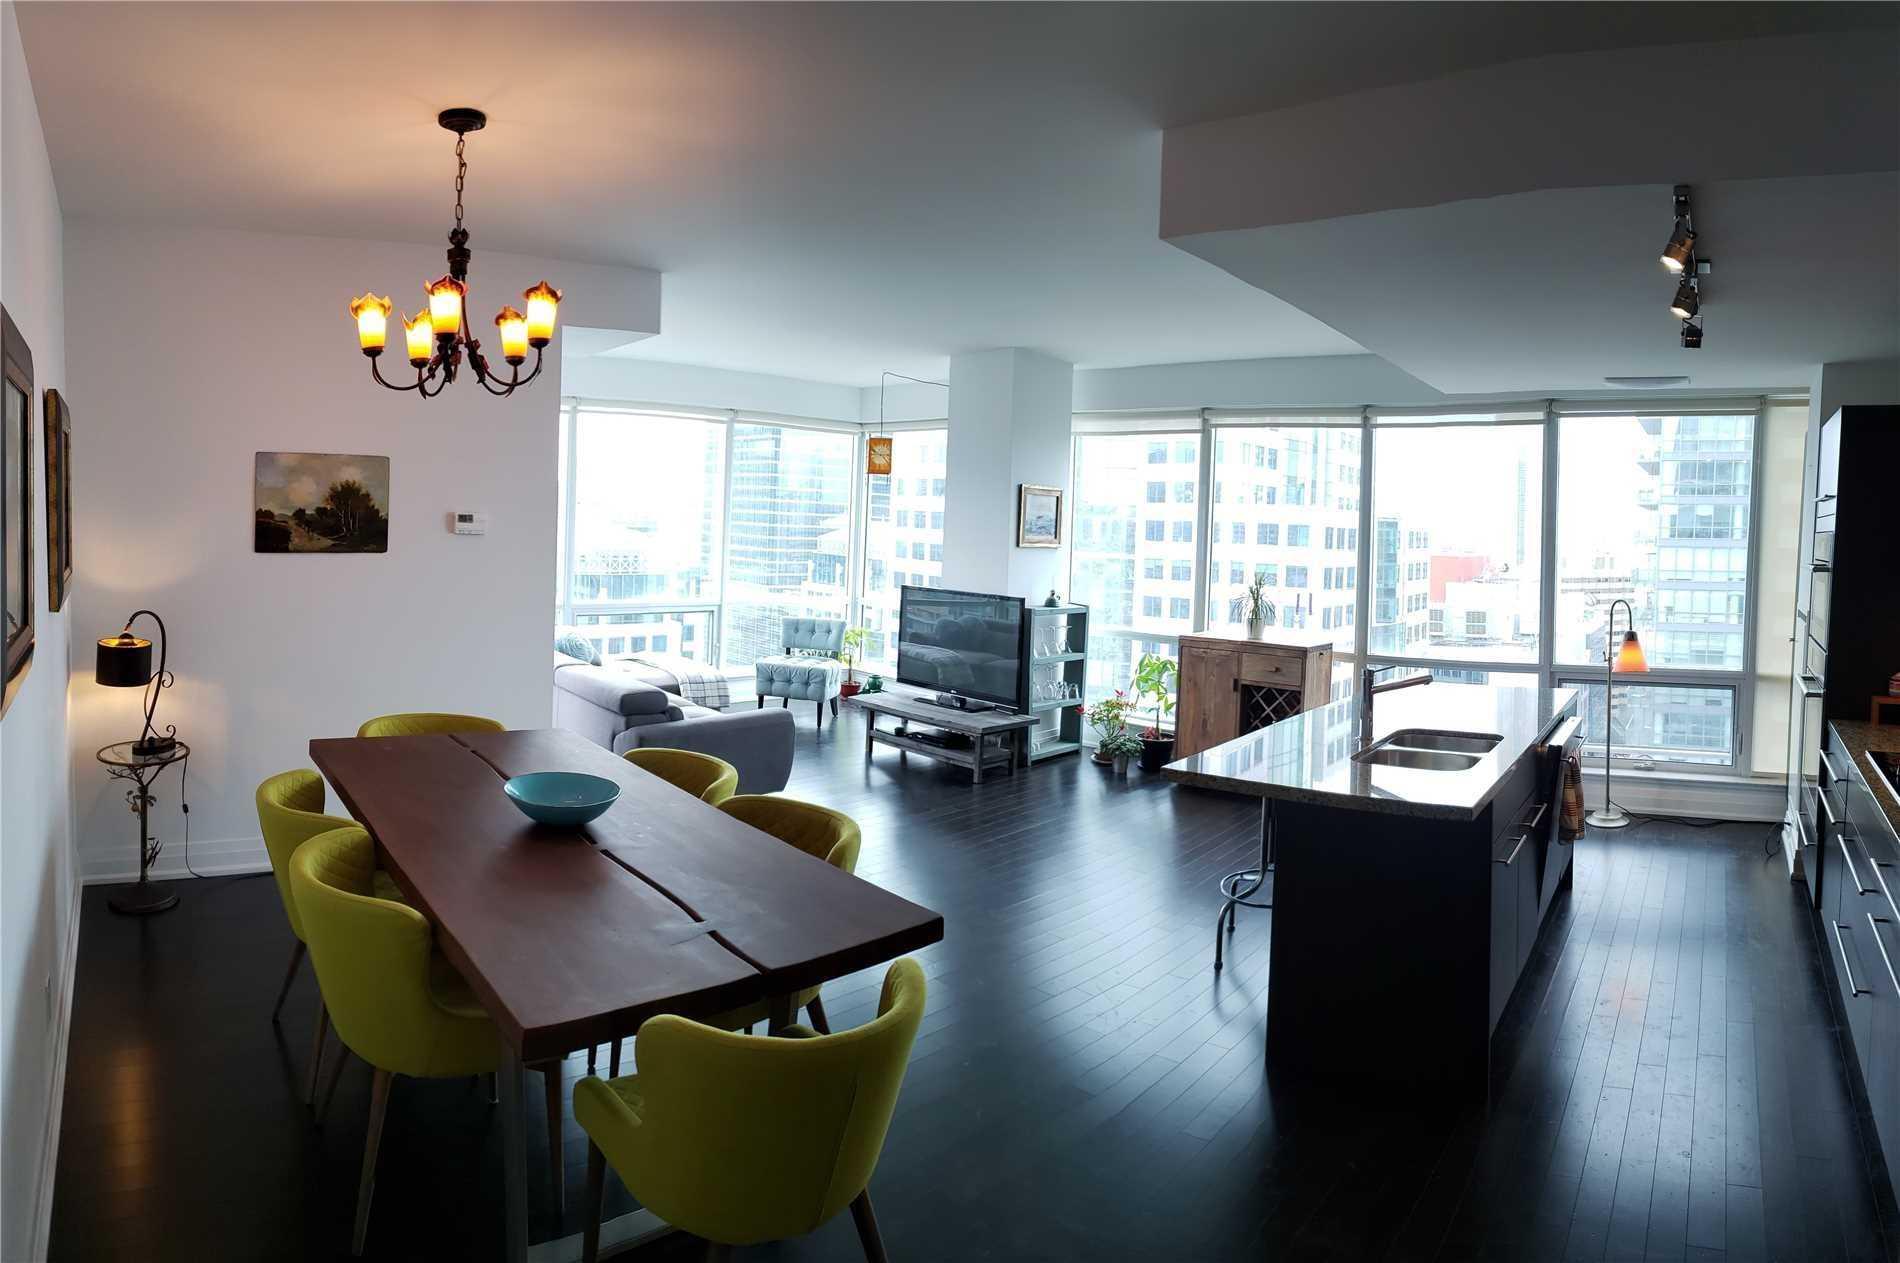 Astounding 80 John St Toronto Mls C4498846 Entertainment District Real Estate Home Remodeling Inspirations Cosmcuboardxyz